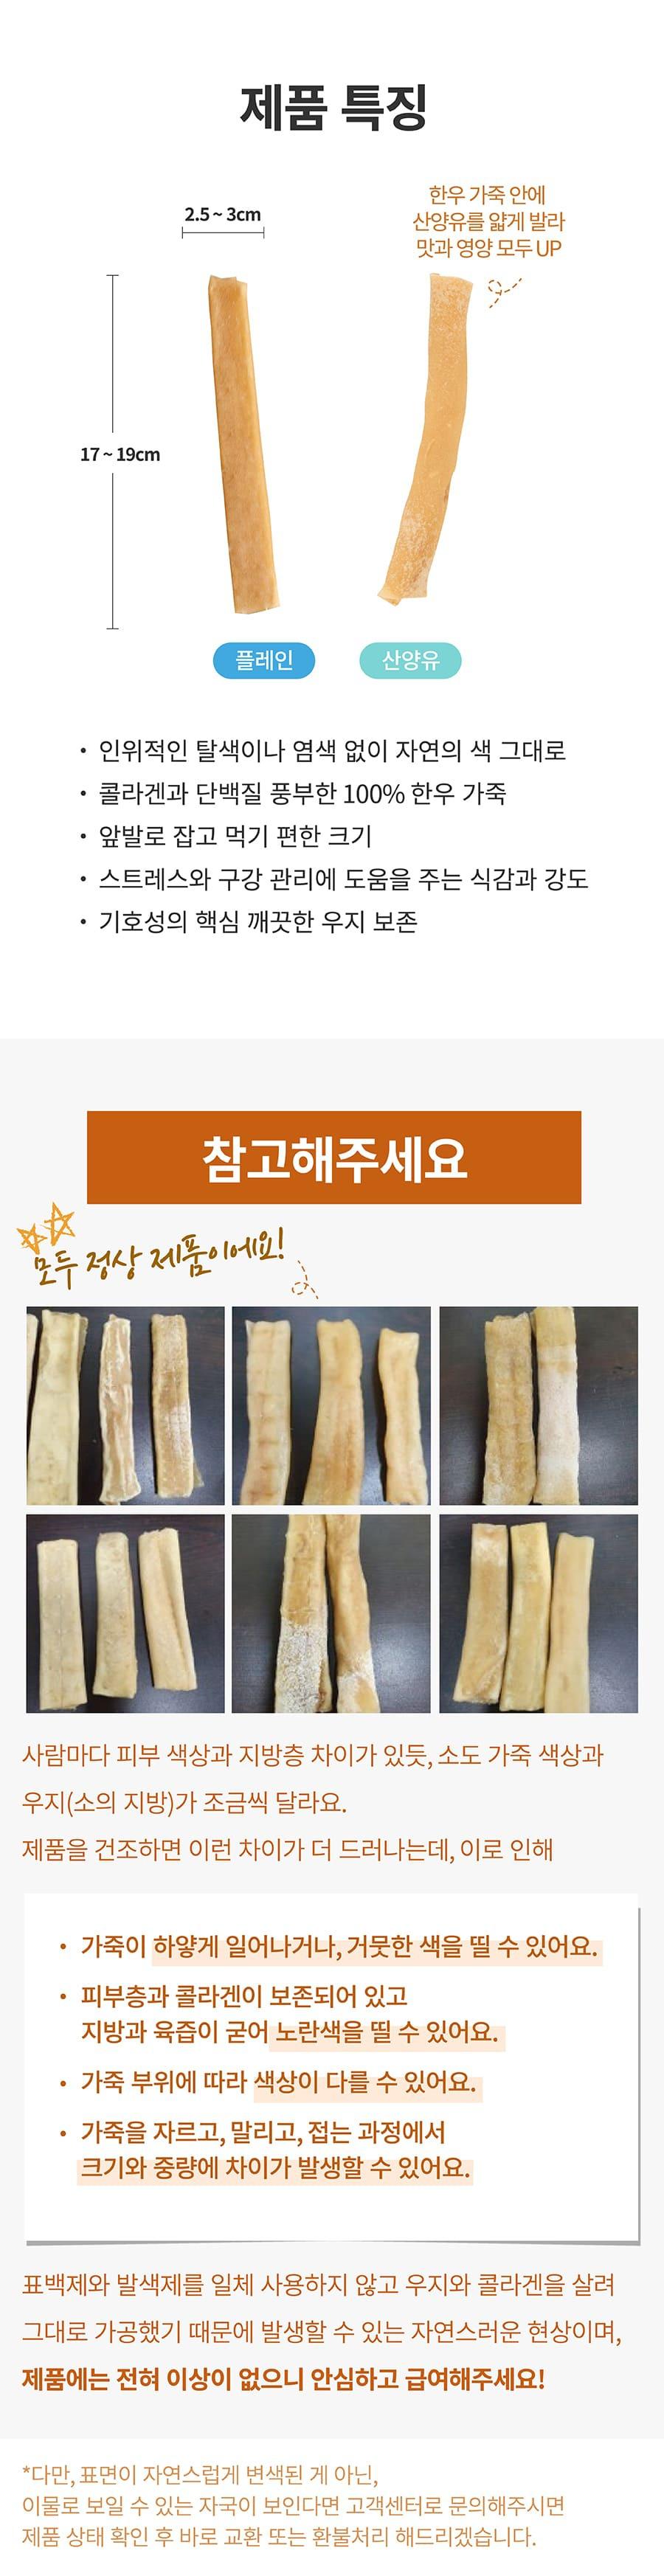 it 츄잇 중대형견용 (플레인/산양유)-상품이미지-34